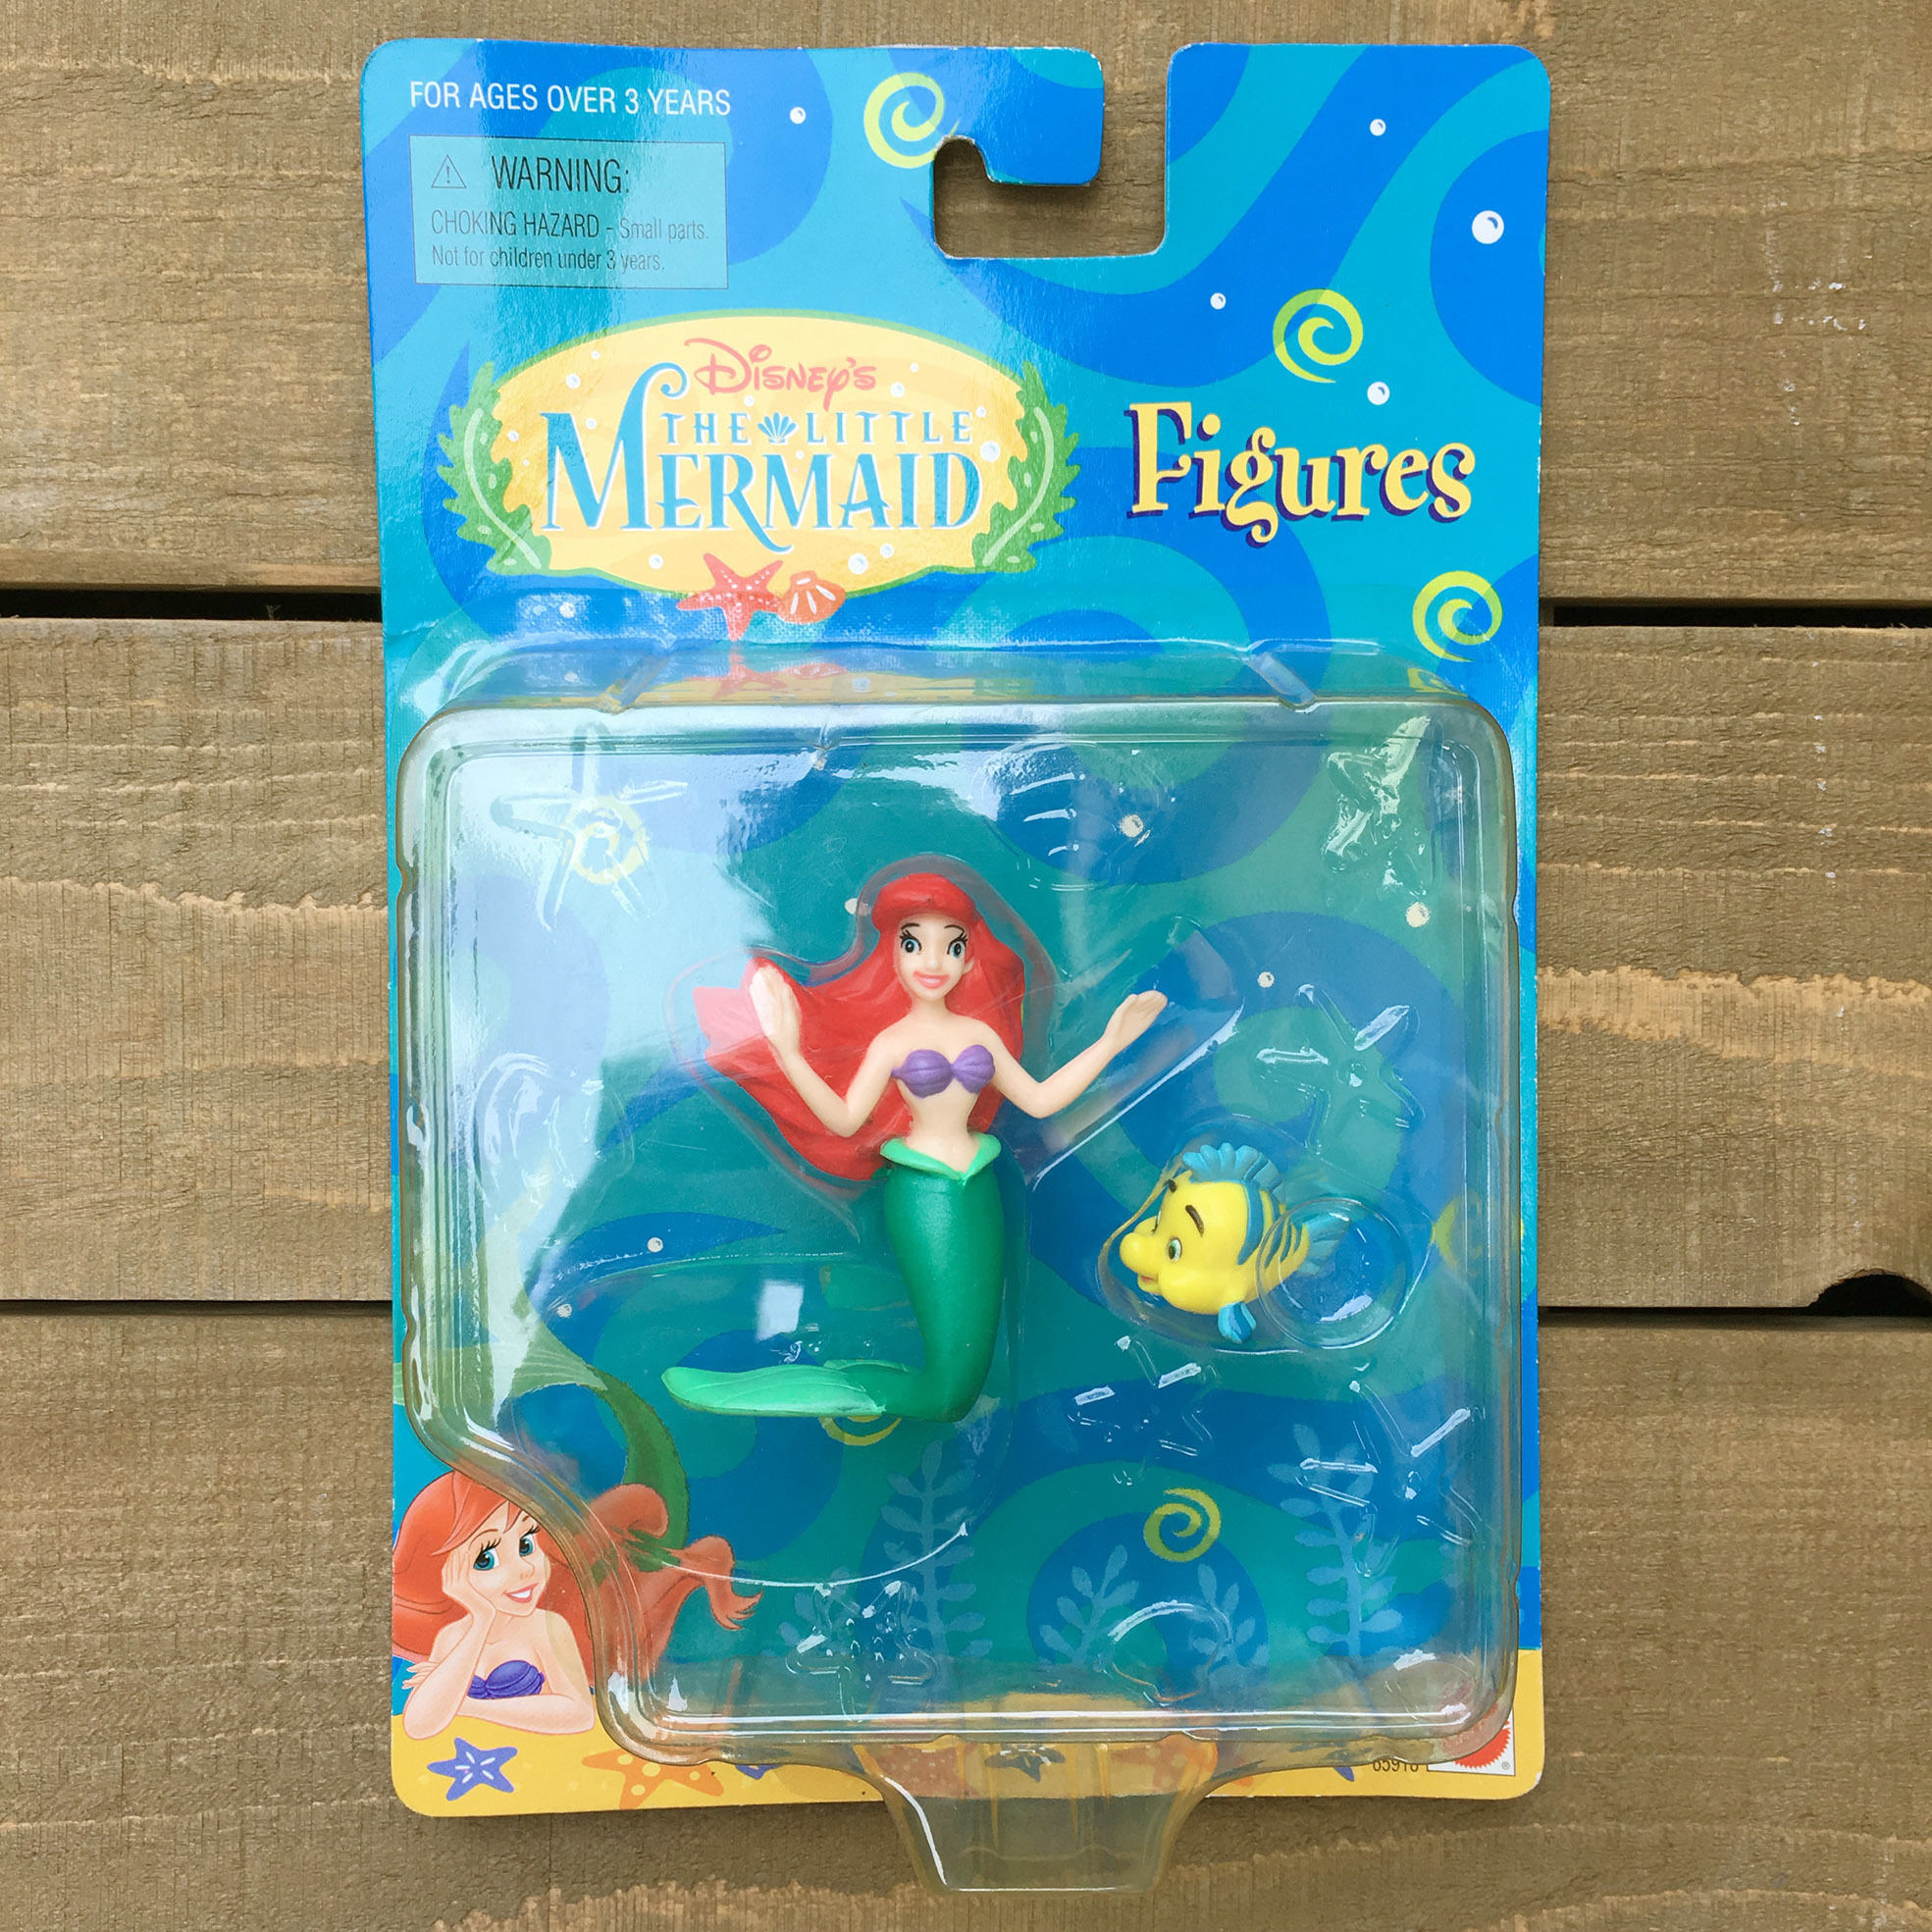 THE LITTLE MERMAID Ariel & Flounder Figure Set/リトルマーメイド アリエル&フランダー フィギュアセット/170506-2